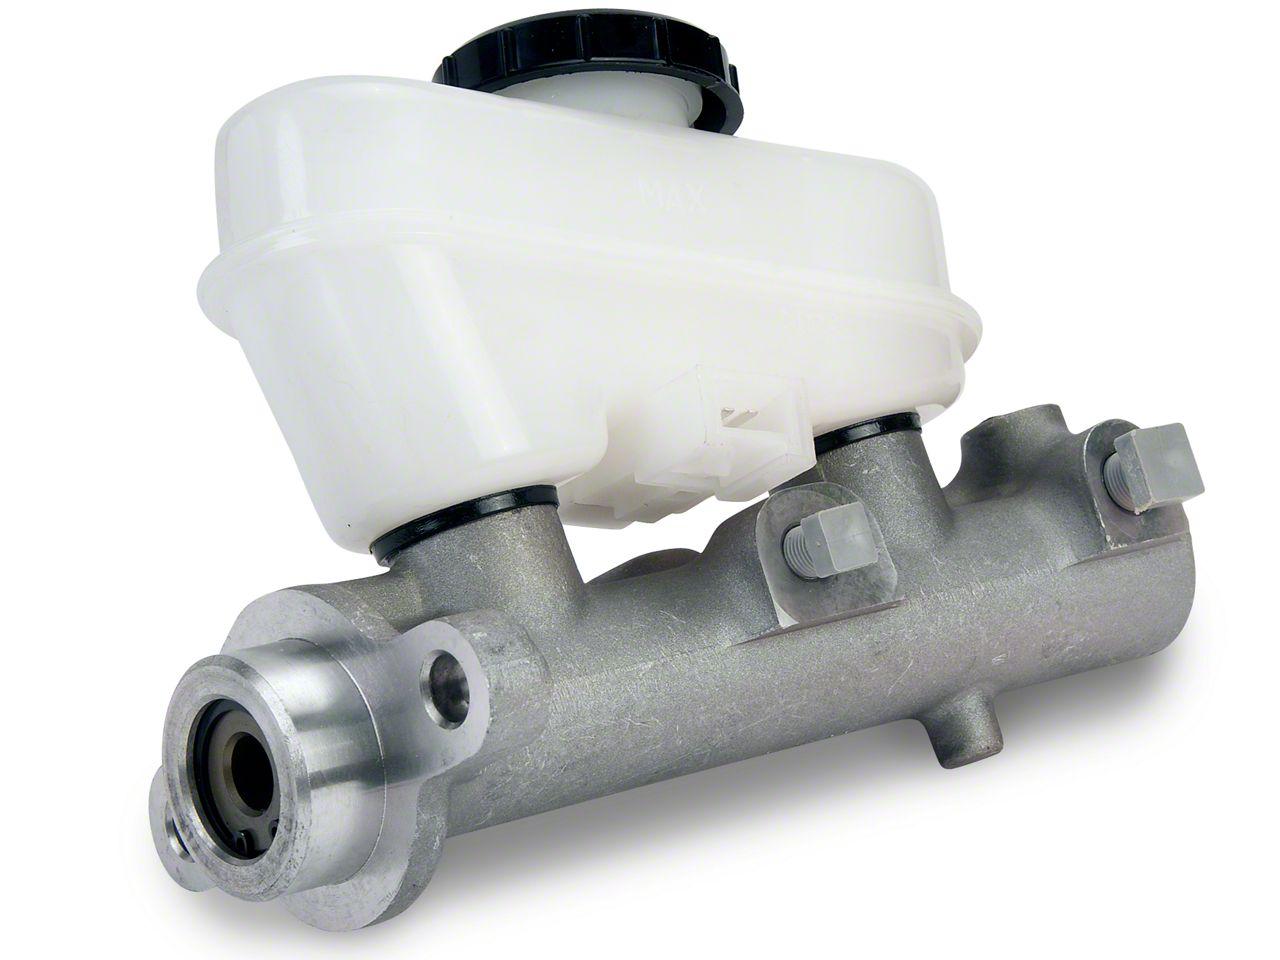 Brake Master Cylinder For 1993 Ford Mustang SVT Cobra Dorman M390125